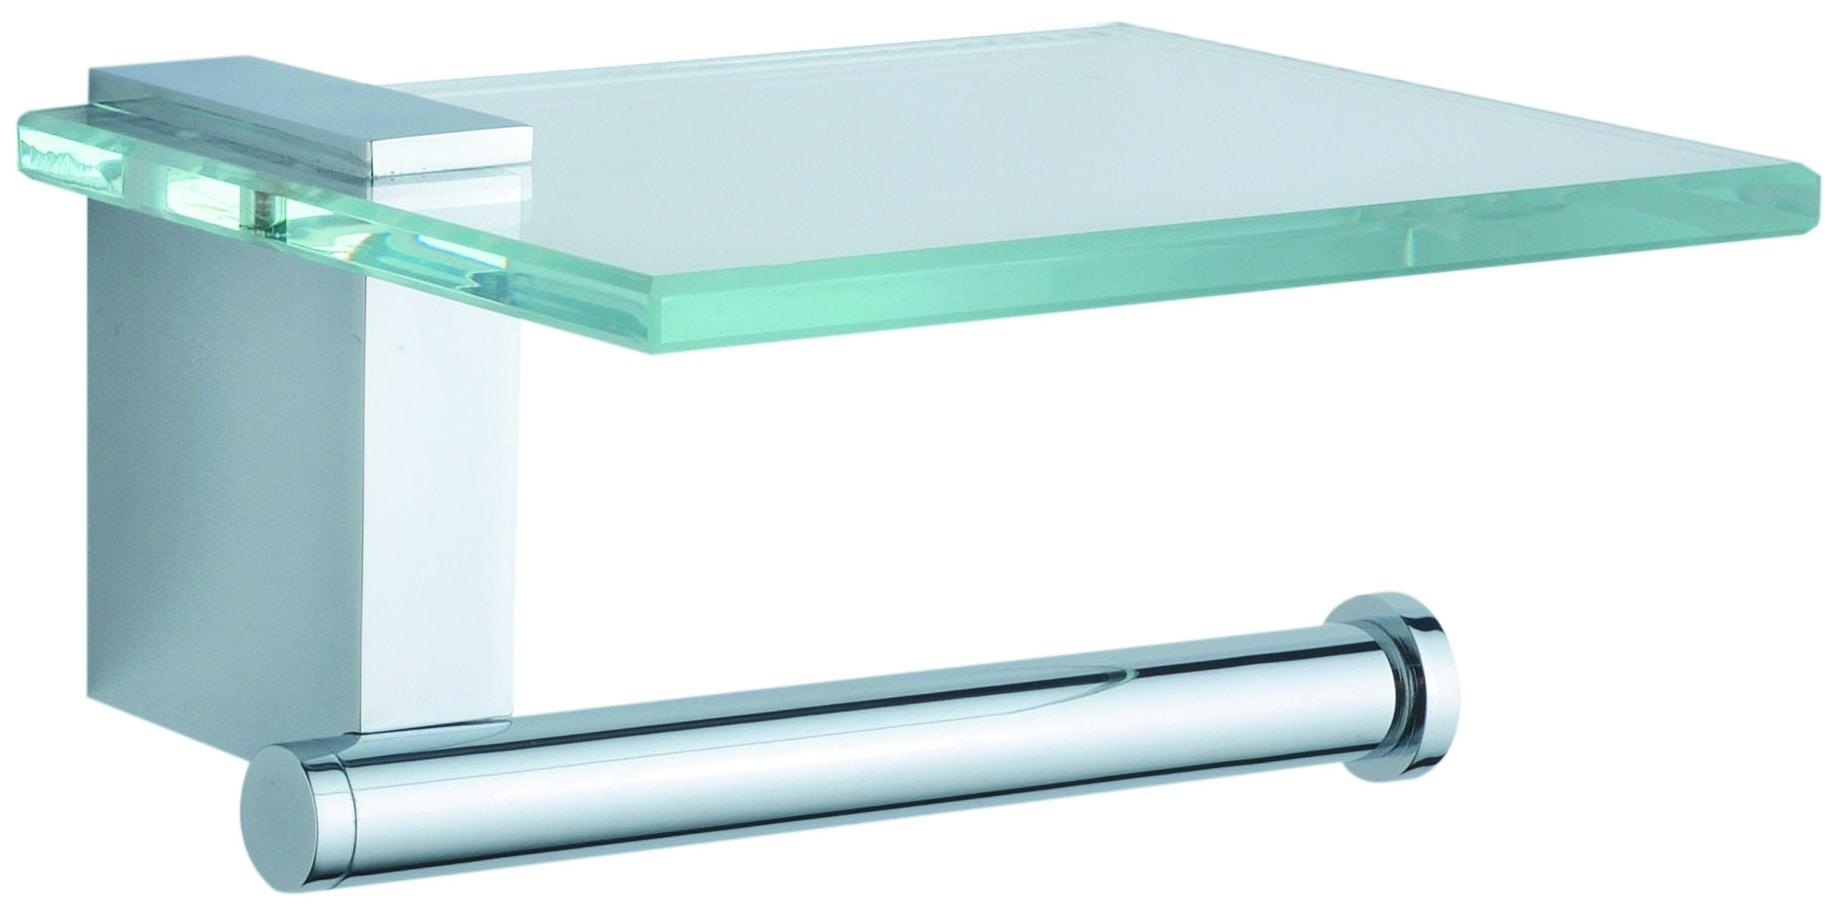 Diagon Shelf + Roll Holder